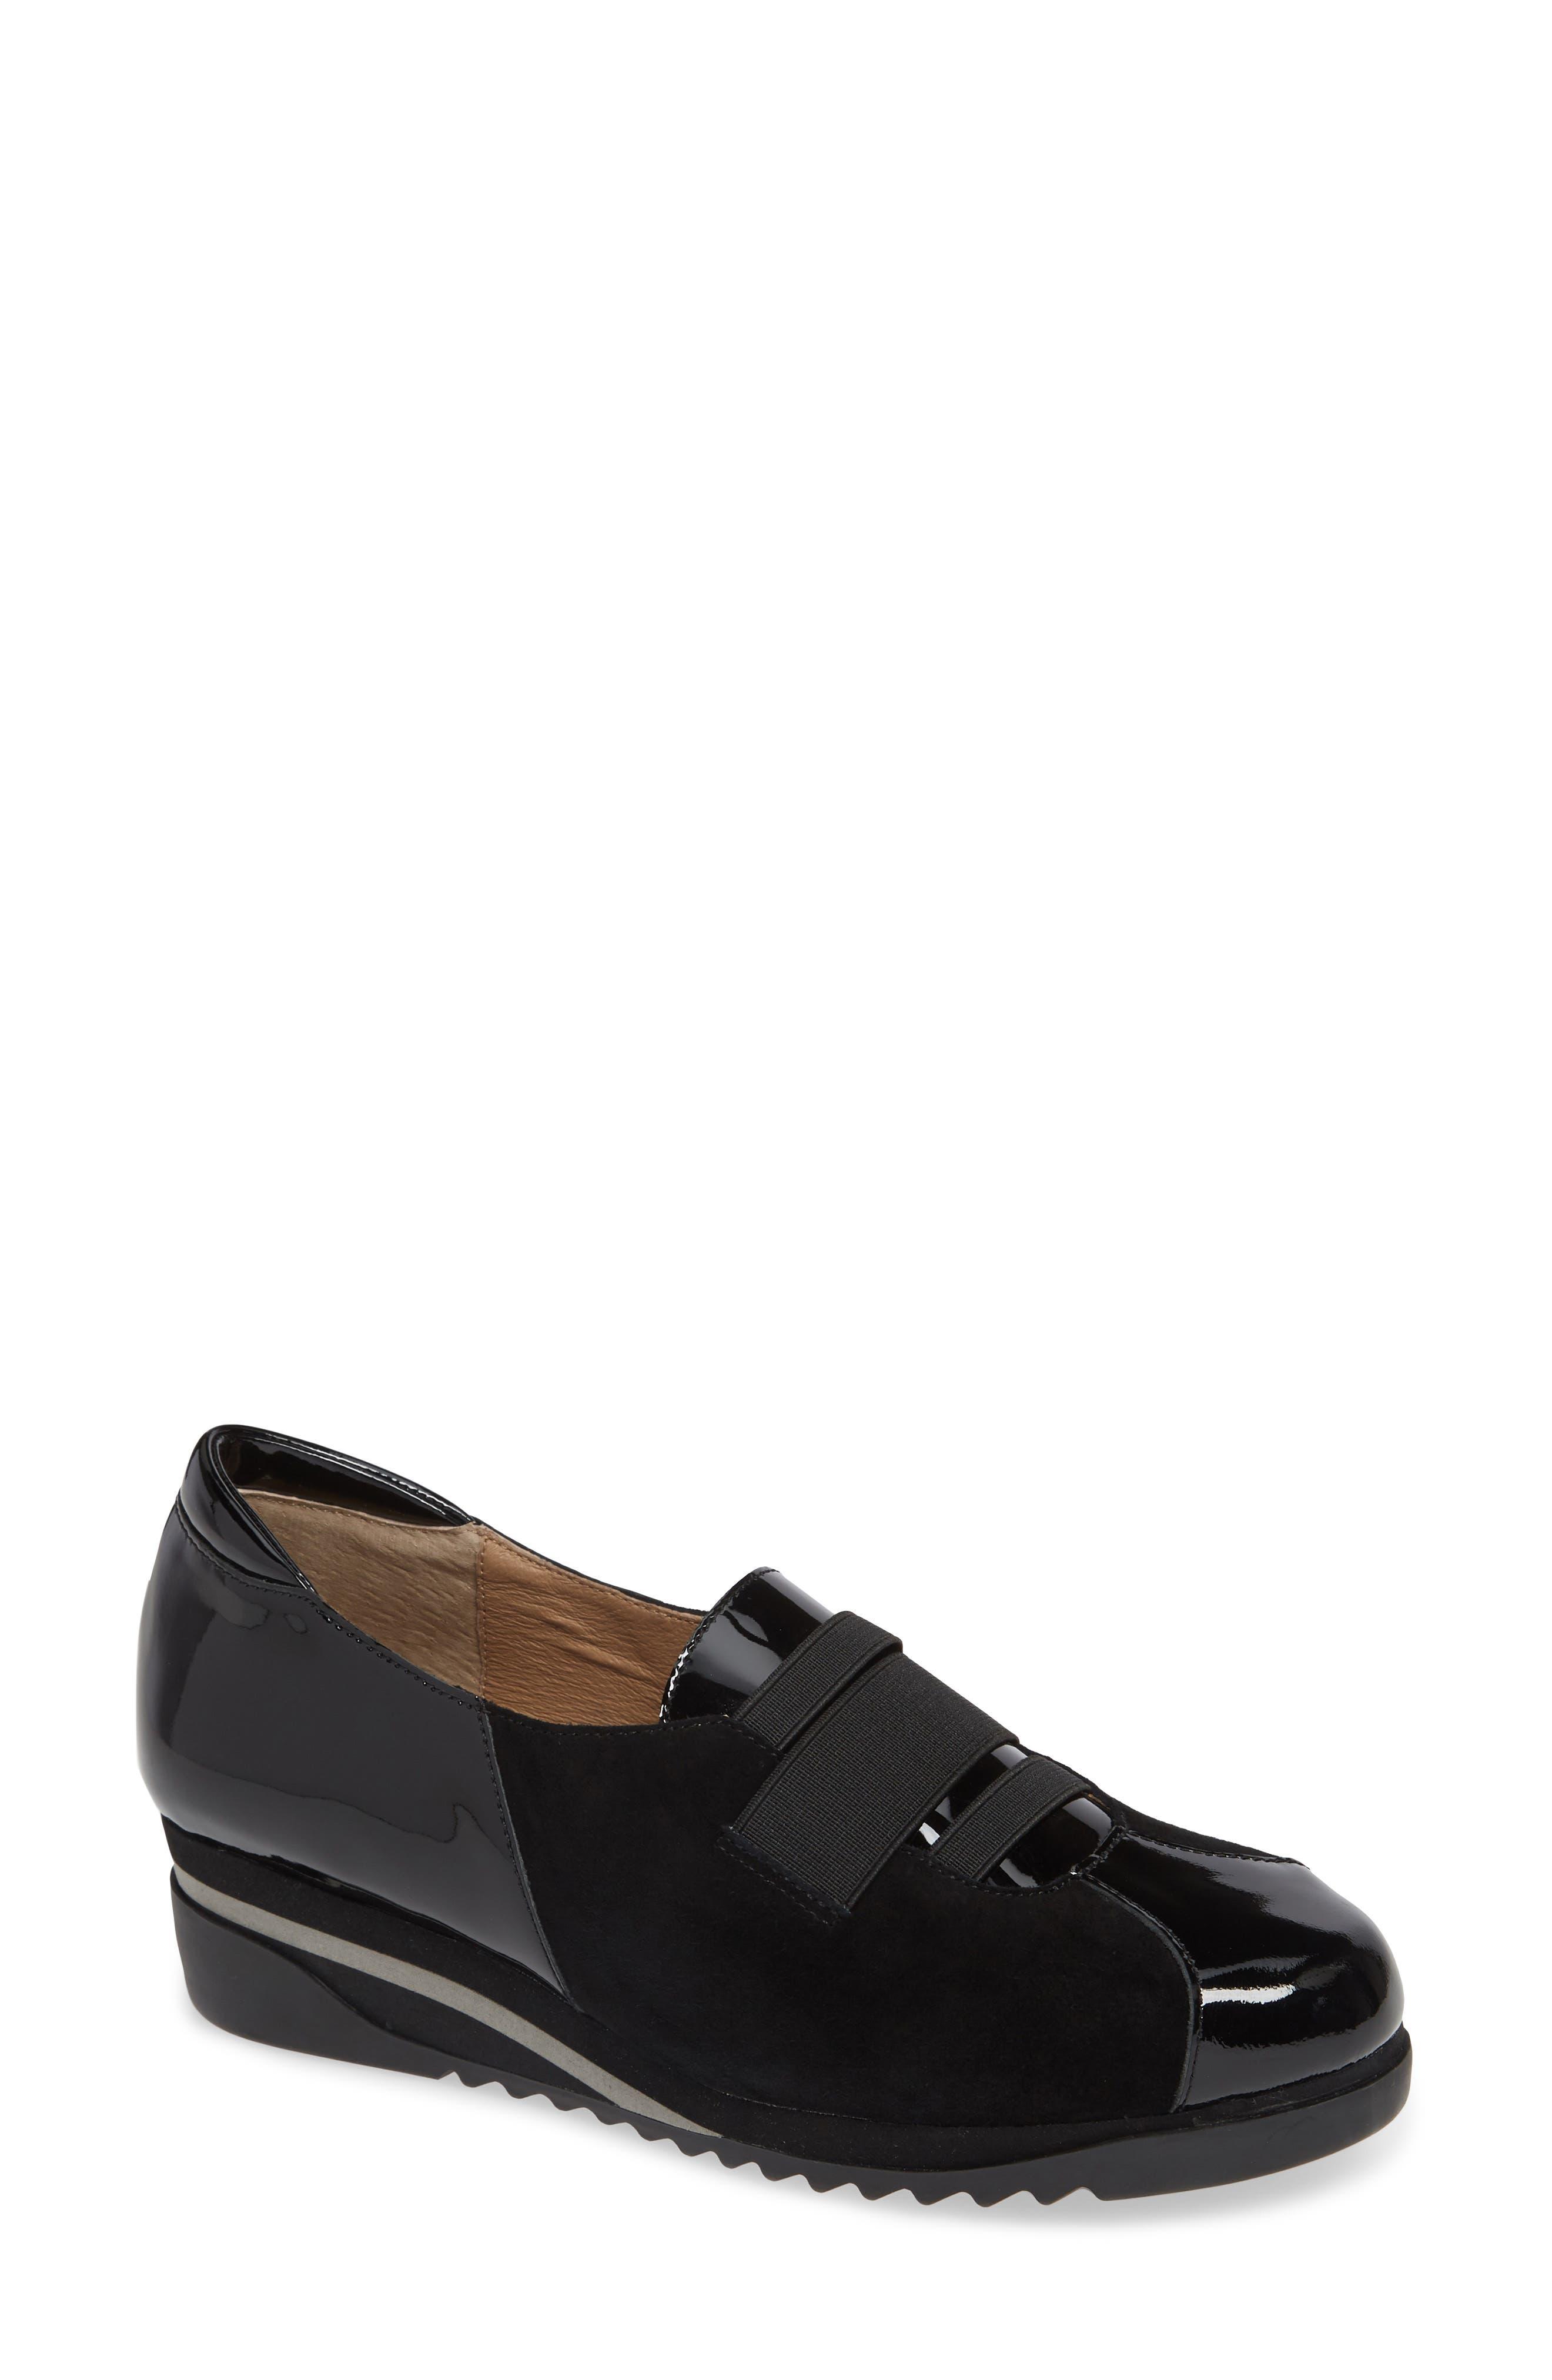 Taytum Sneaker,                             Main thumbnail 1, color,                             BLACK SUEDE